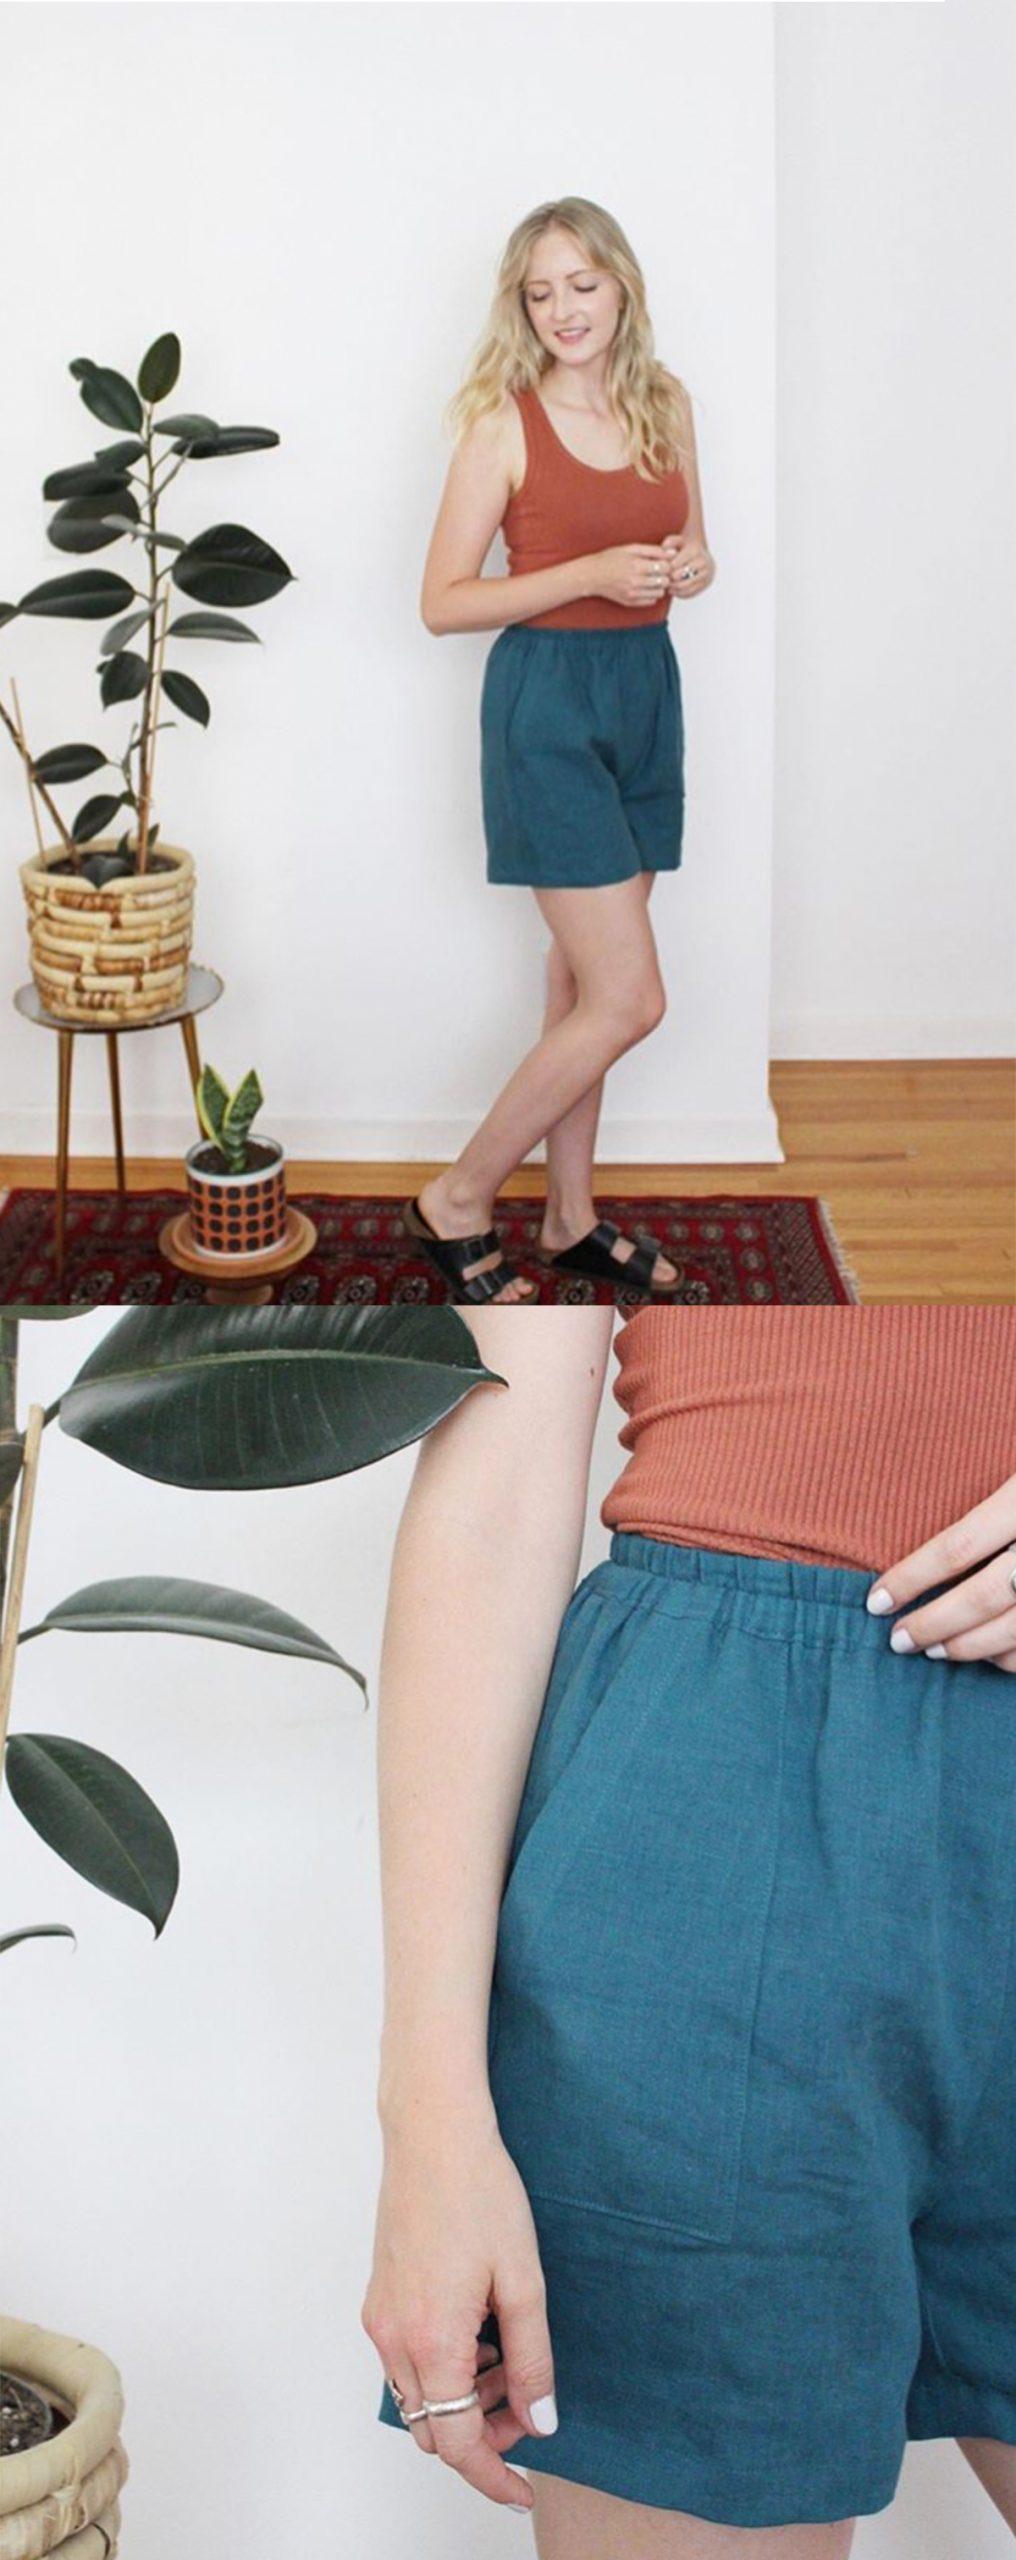 Star's Opal shorts